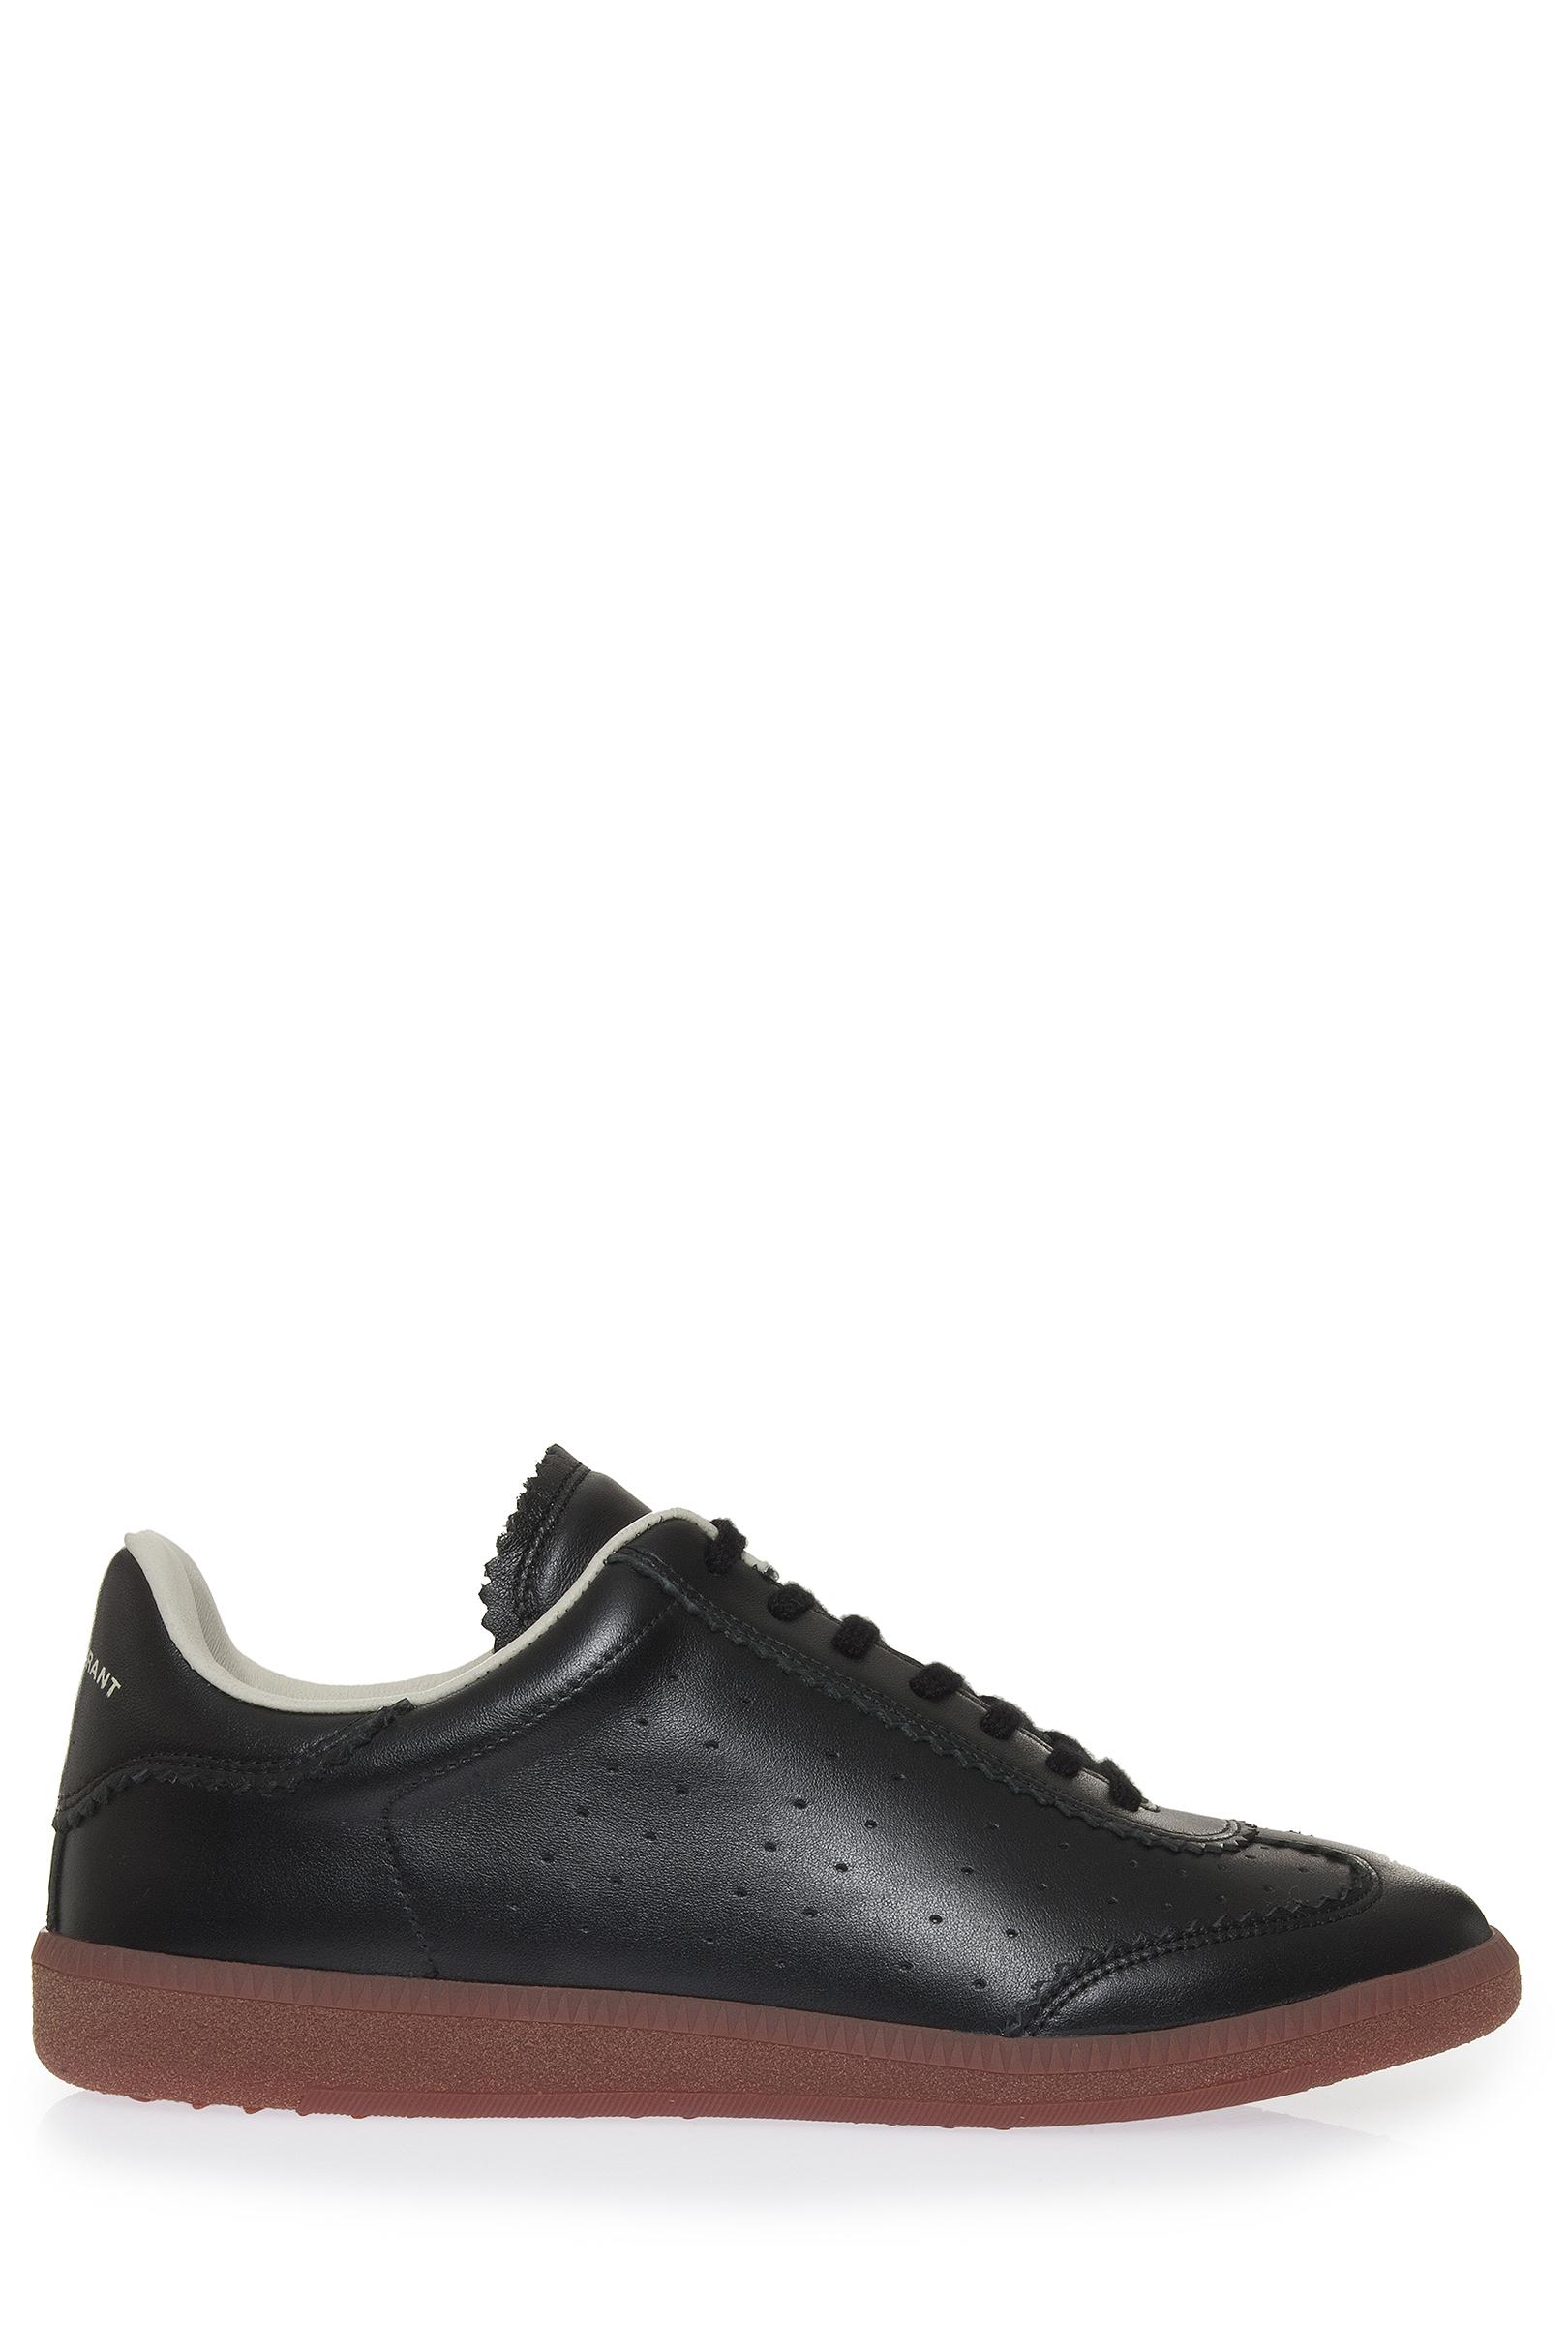 toile isabel marant bryce sneakers in black lyst. Black Bedroom Furniture Sets. Home Design Ideas